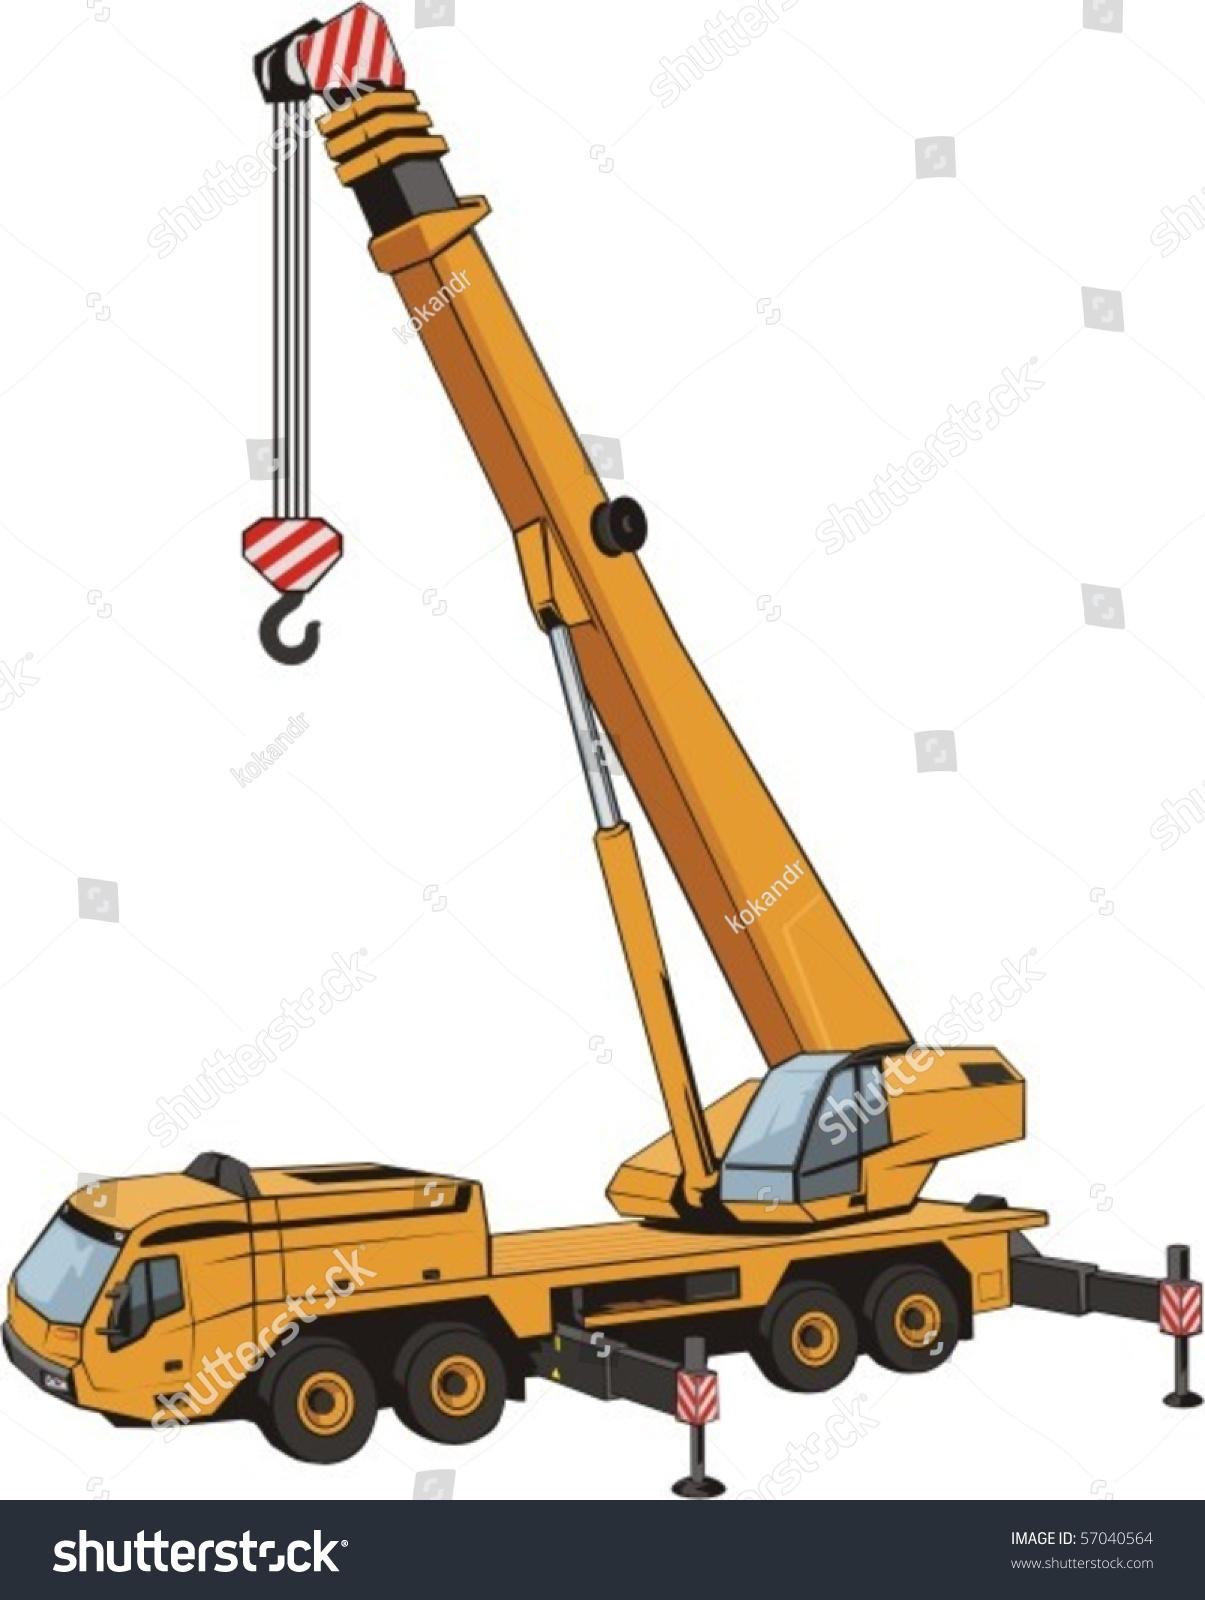 Mobile Crane Terminology : Mobile crane lifted by arrow stock vector